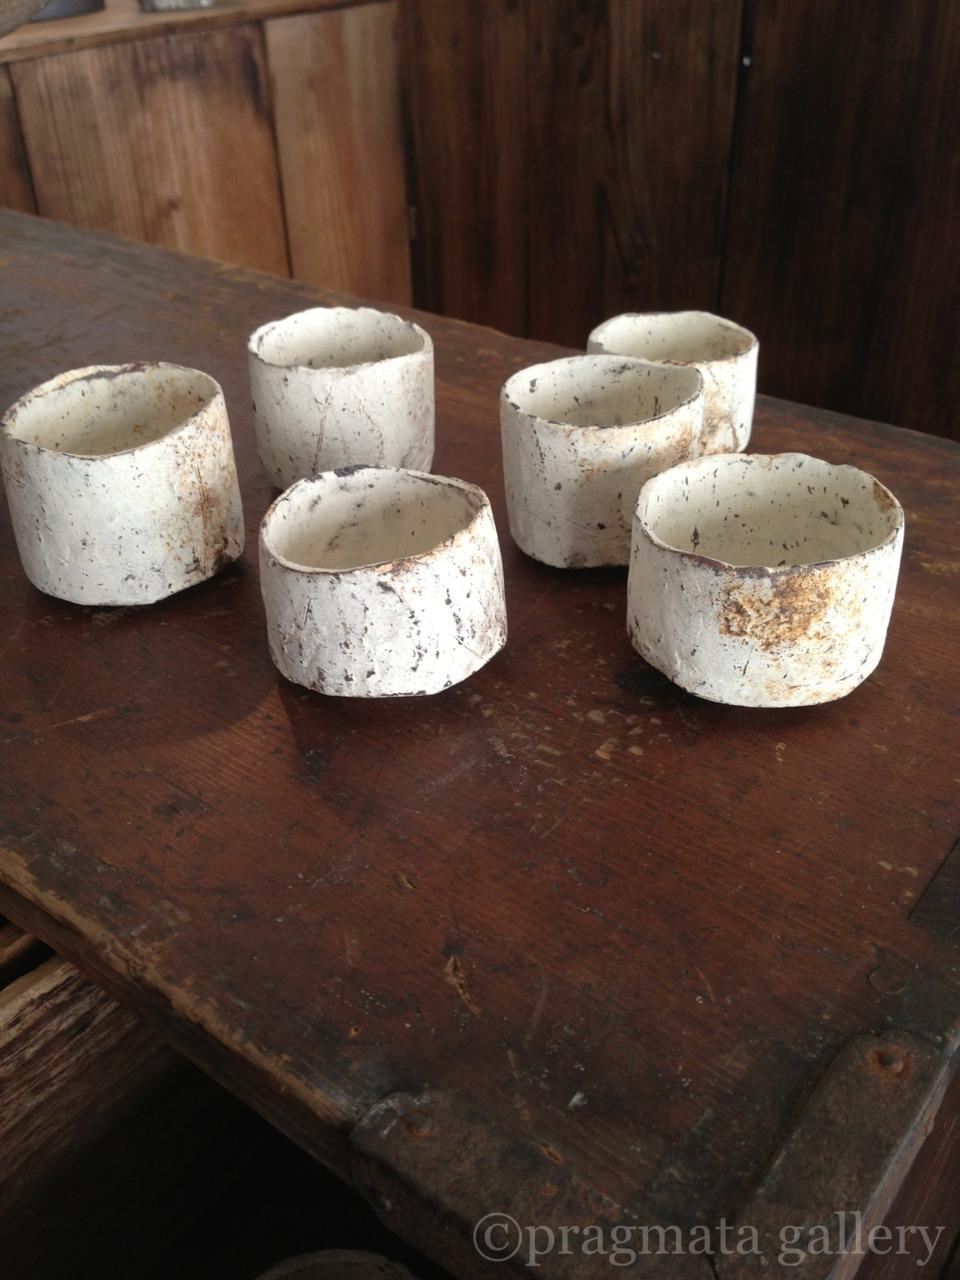 pragmata-gallery :     Small cups by Nikaido Akihiro.   二階堂明弘さんのぐい飲みです。